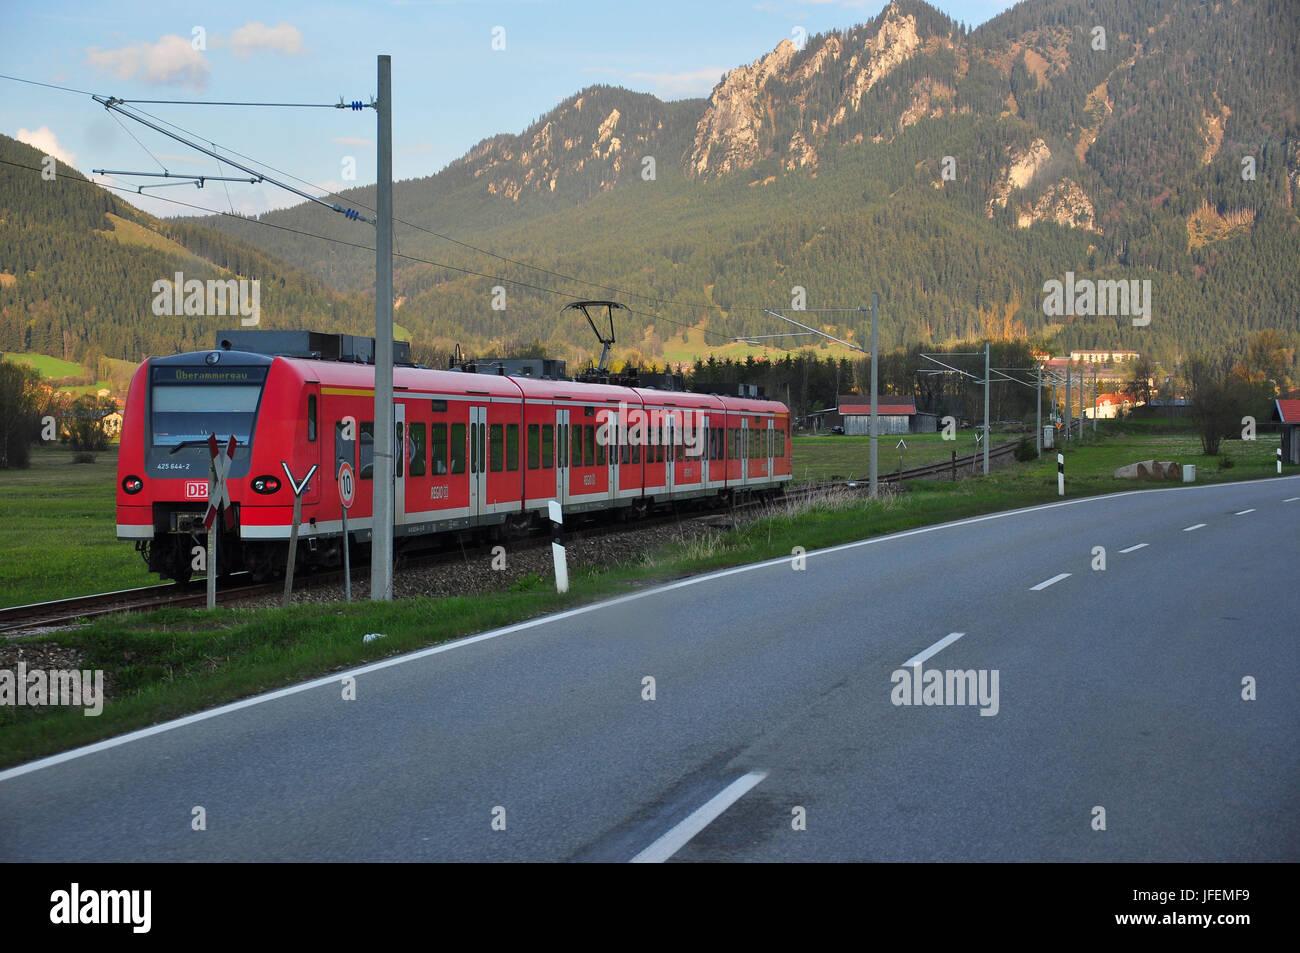 Germany, Bavaria, Werdenfels, Ammer's region, federal highway, commuter train - Stock Image